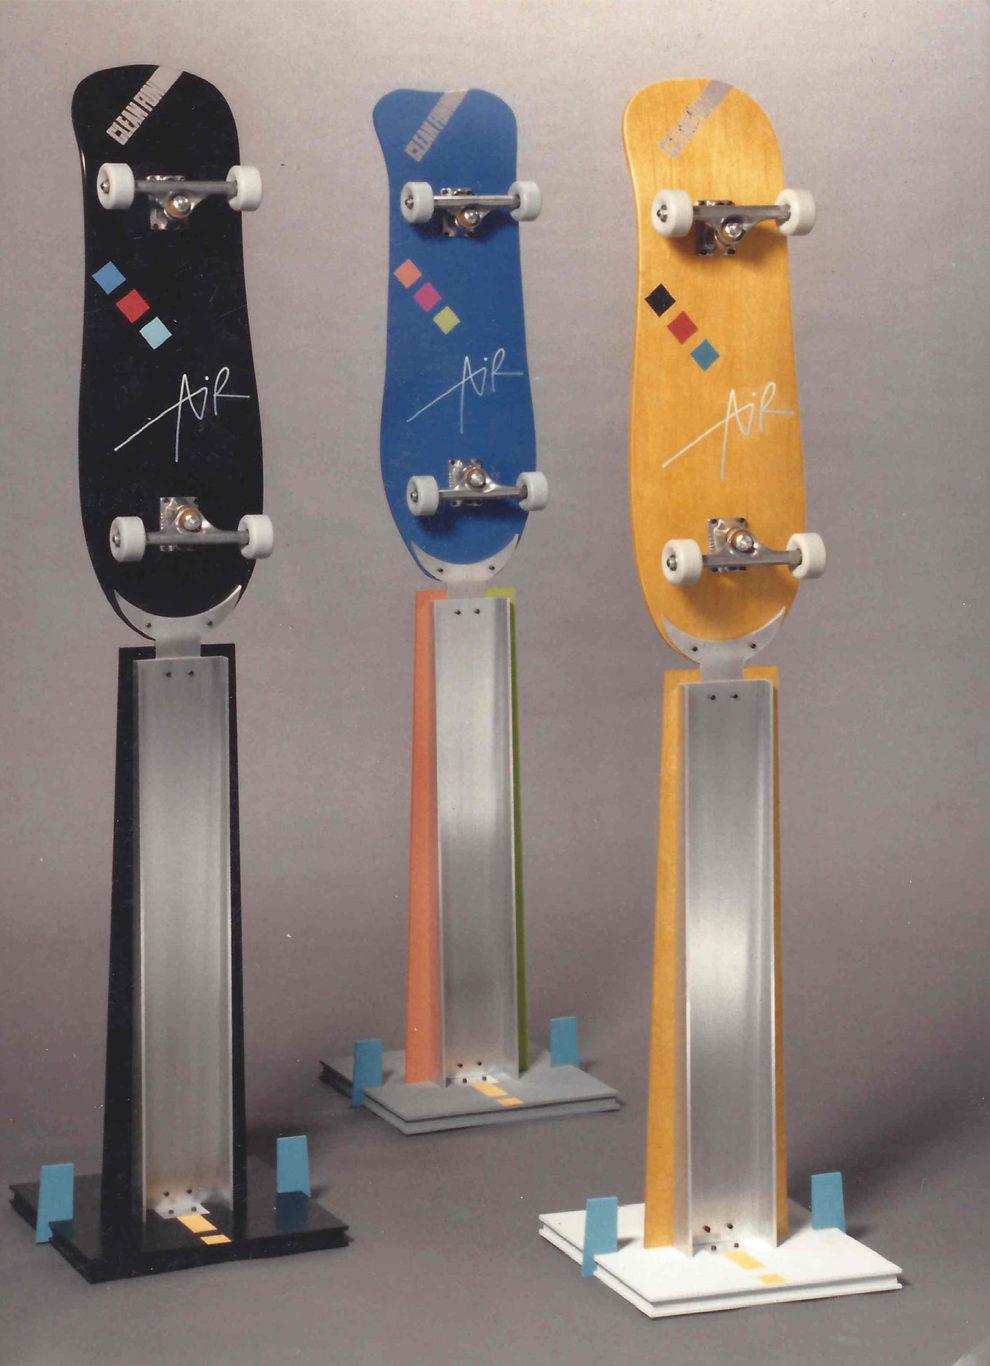 William Eric : Skateboard clothes trees, 1998.